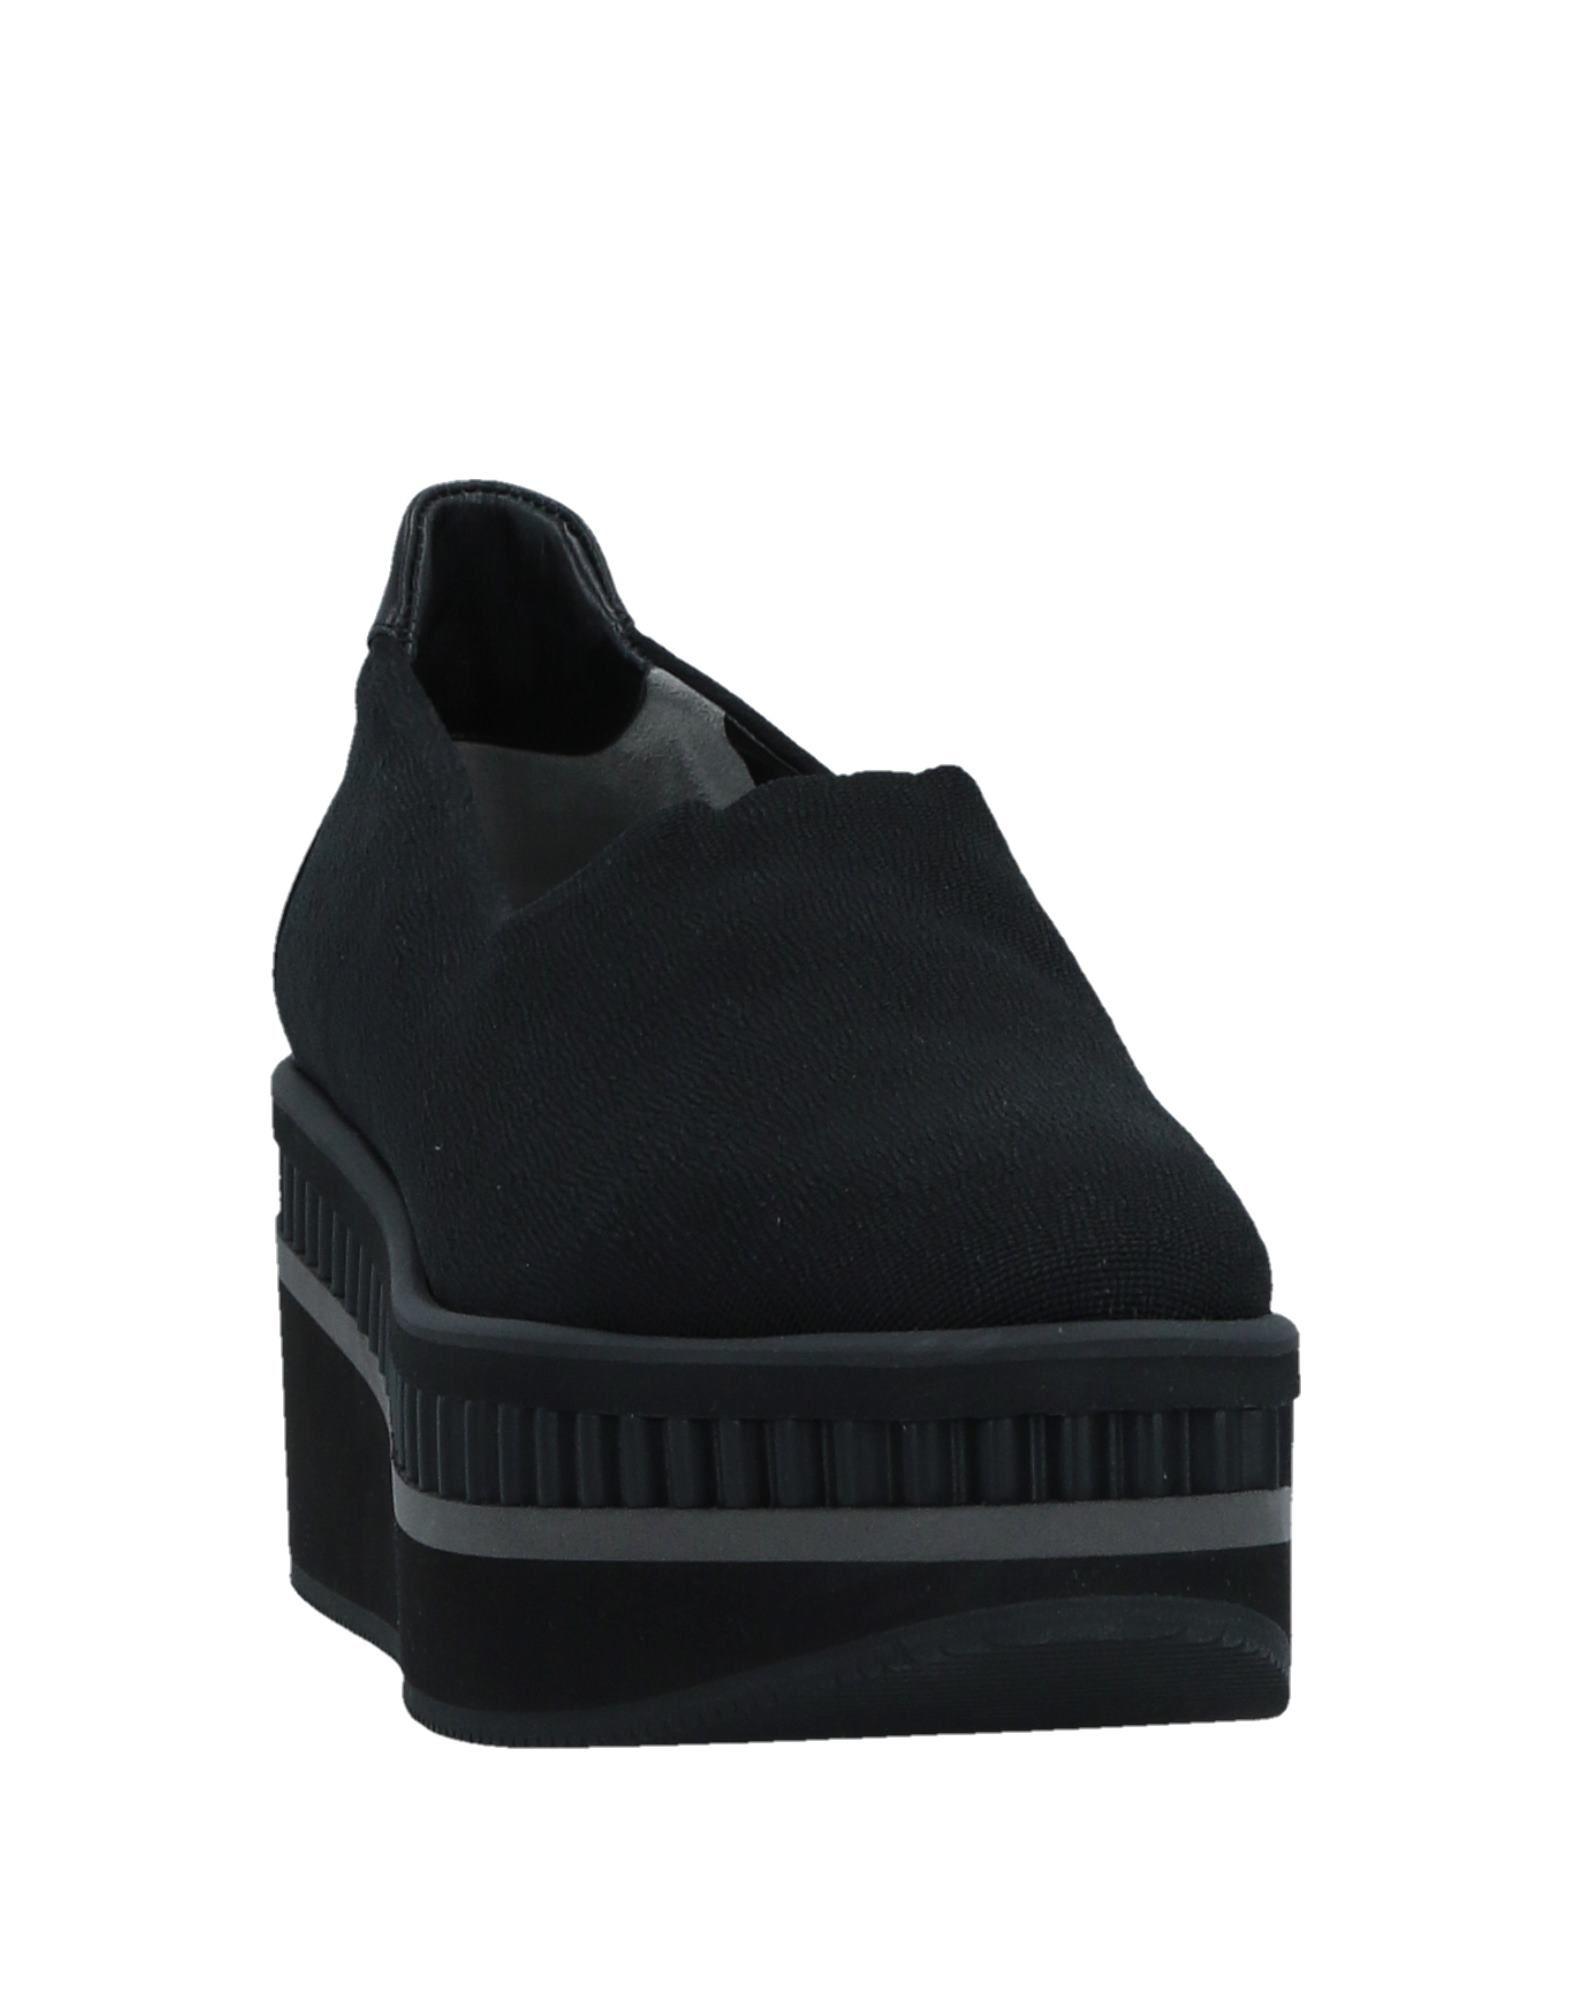 Rabatt Damen Schuhe Robert Clergerie Sneakers Damen Rabatt  11522562WW 85ea77